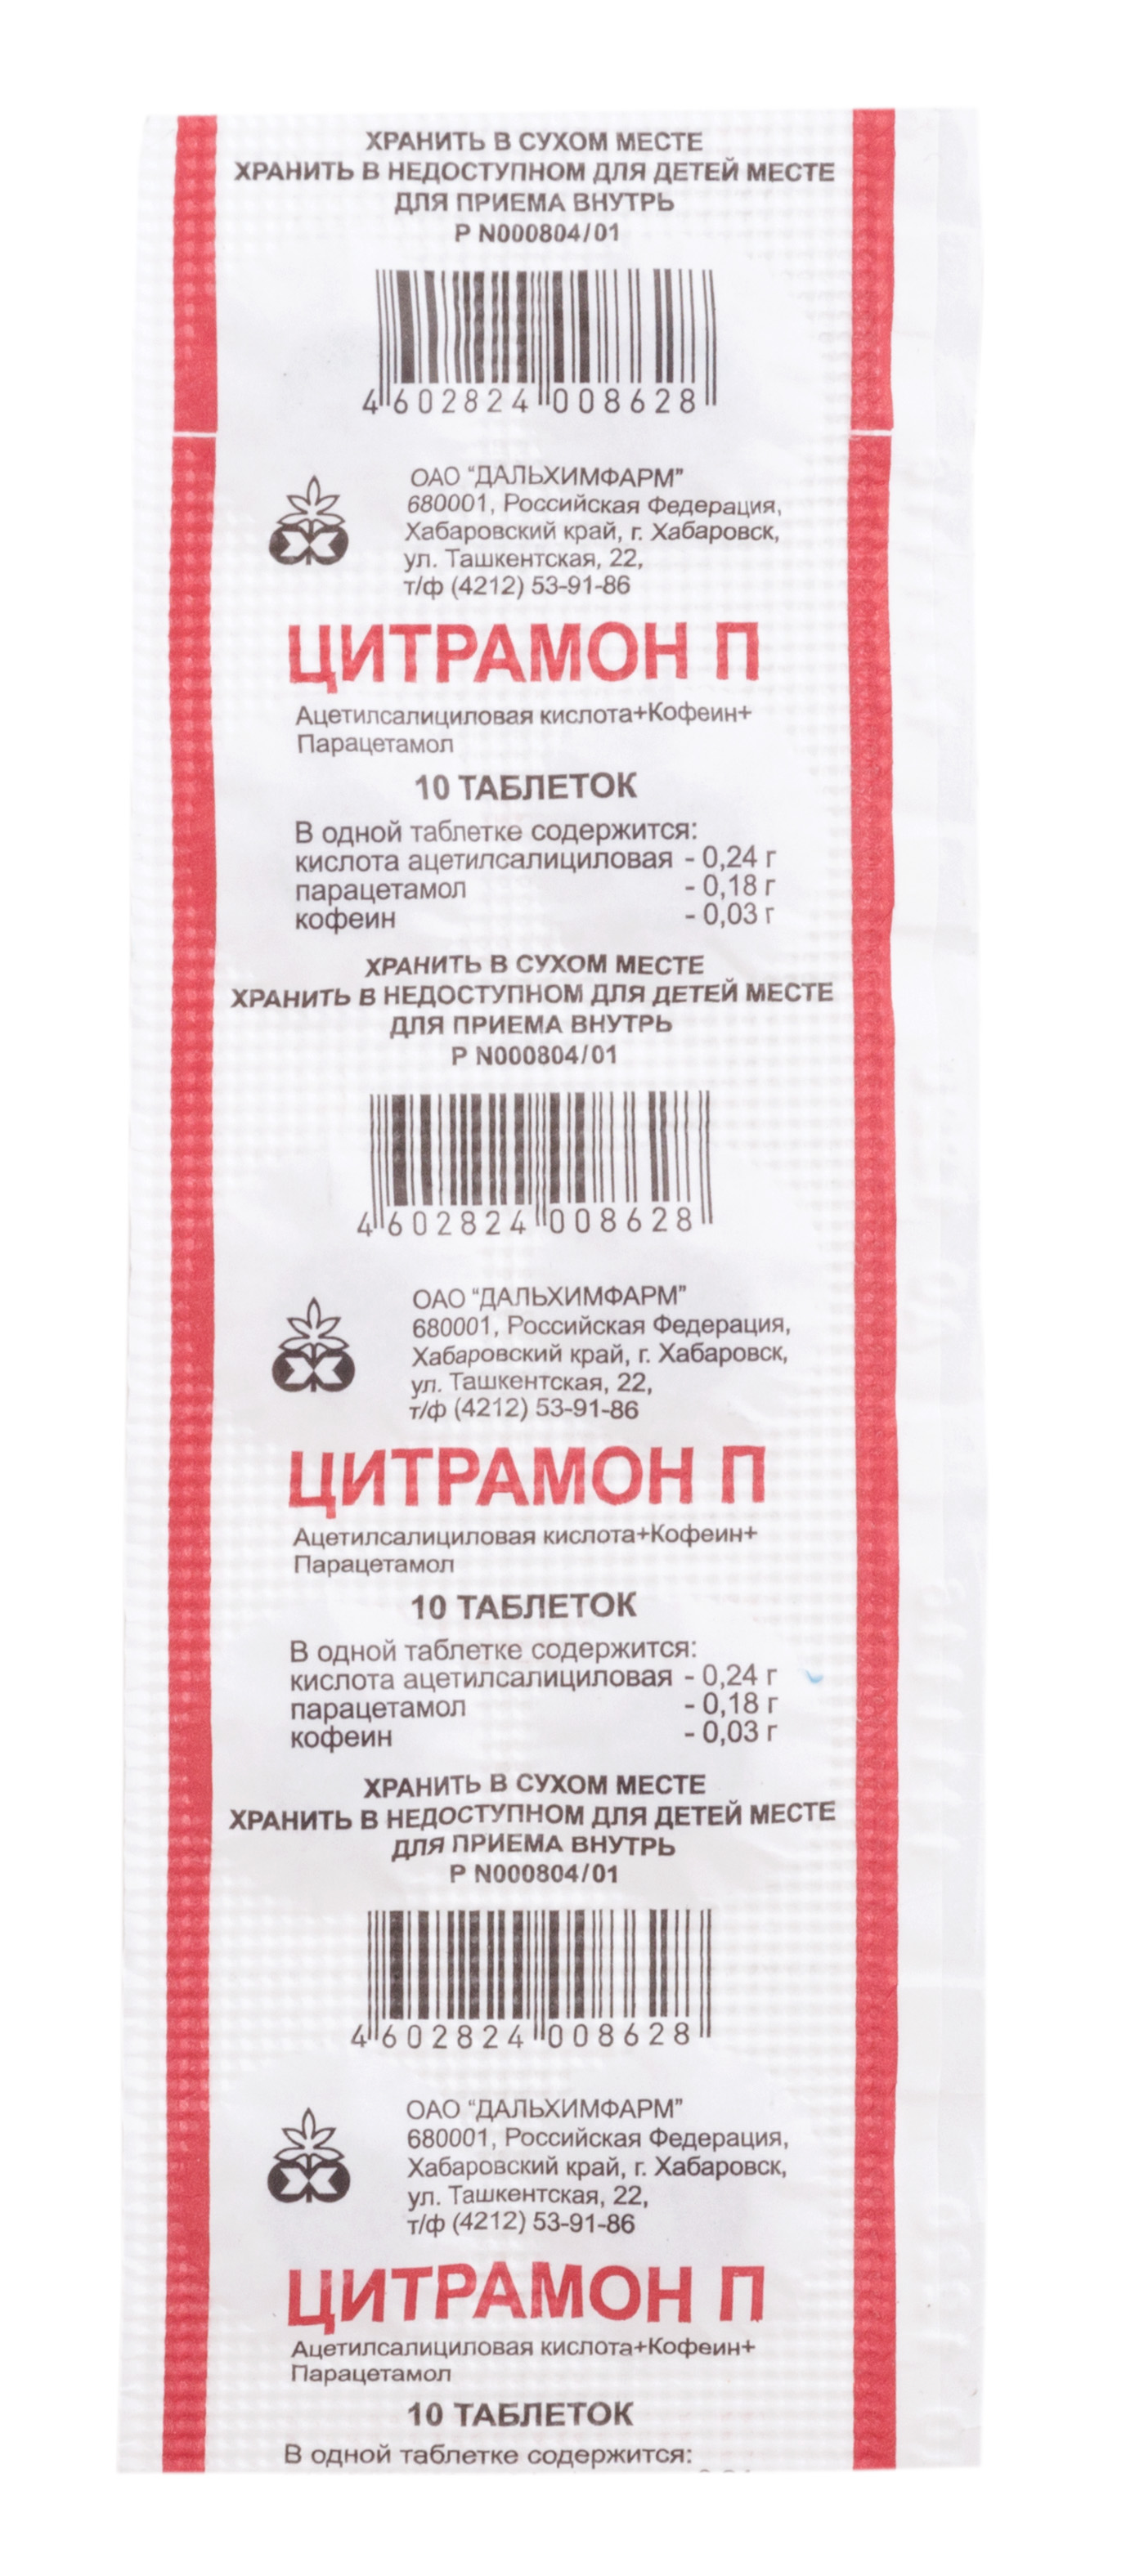 Цитрамон п таблетки №10 Дальхимфарм